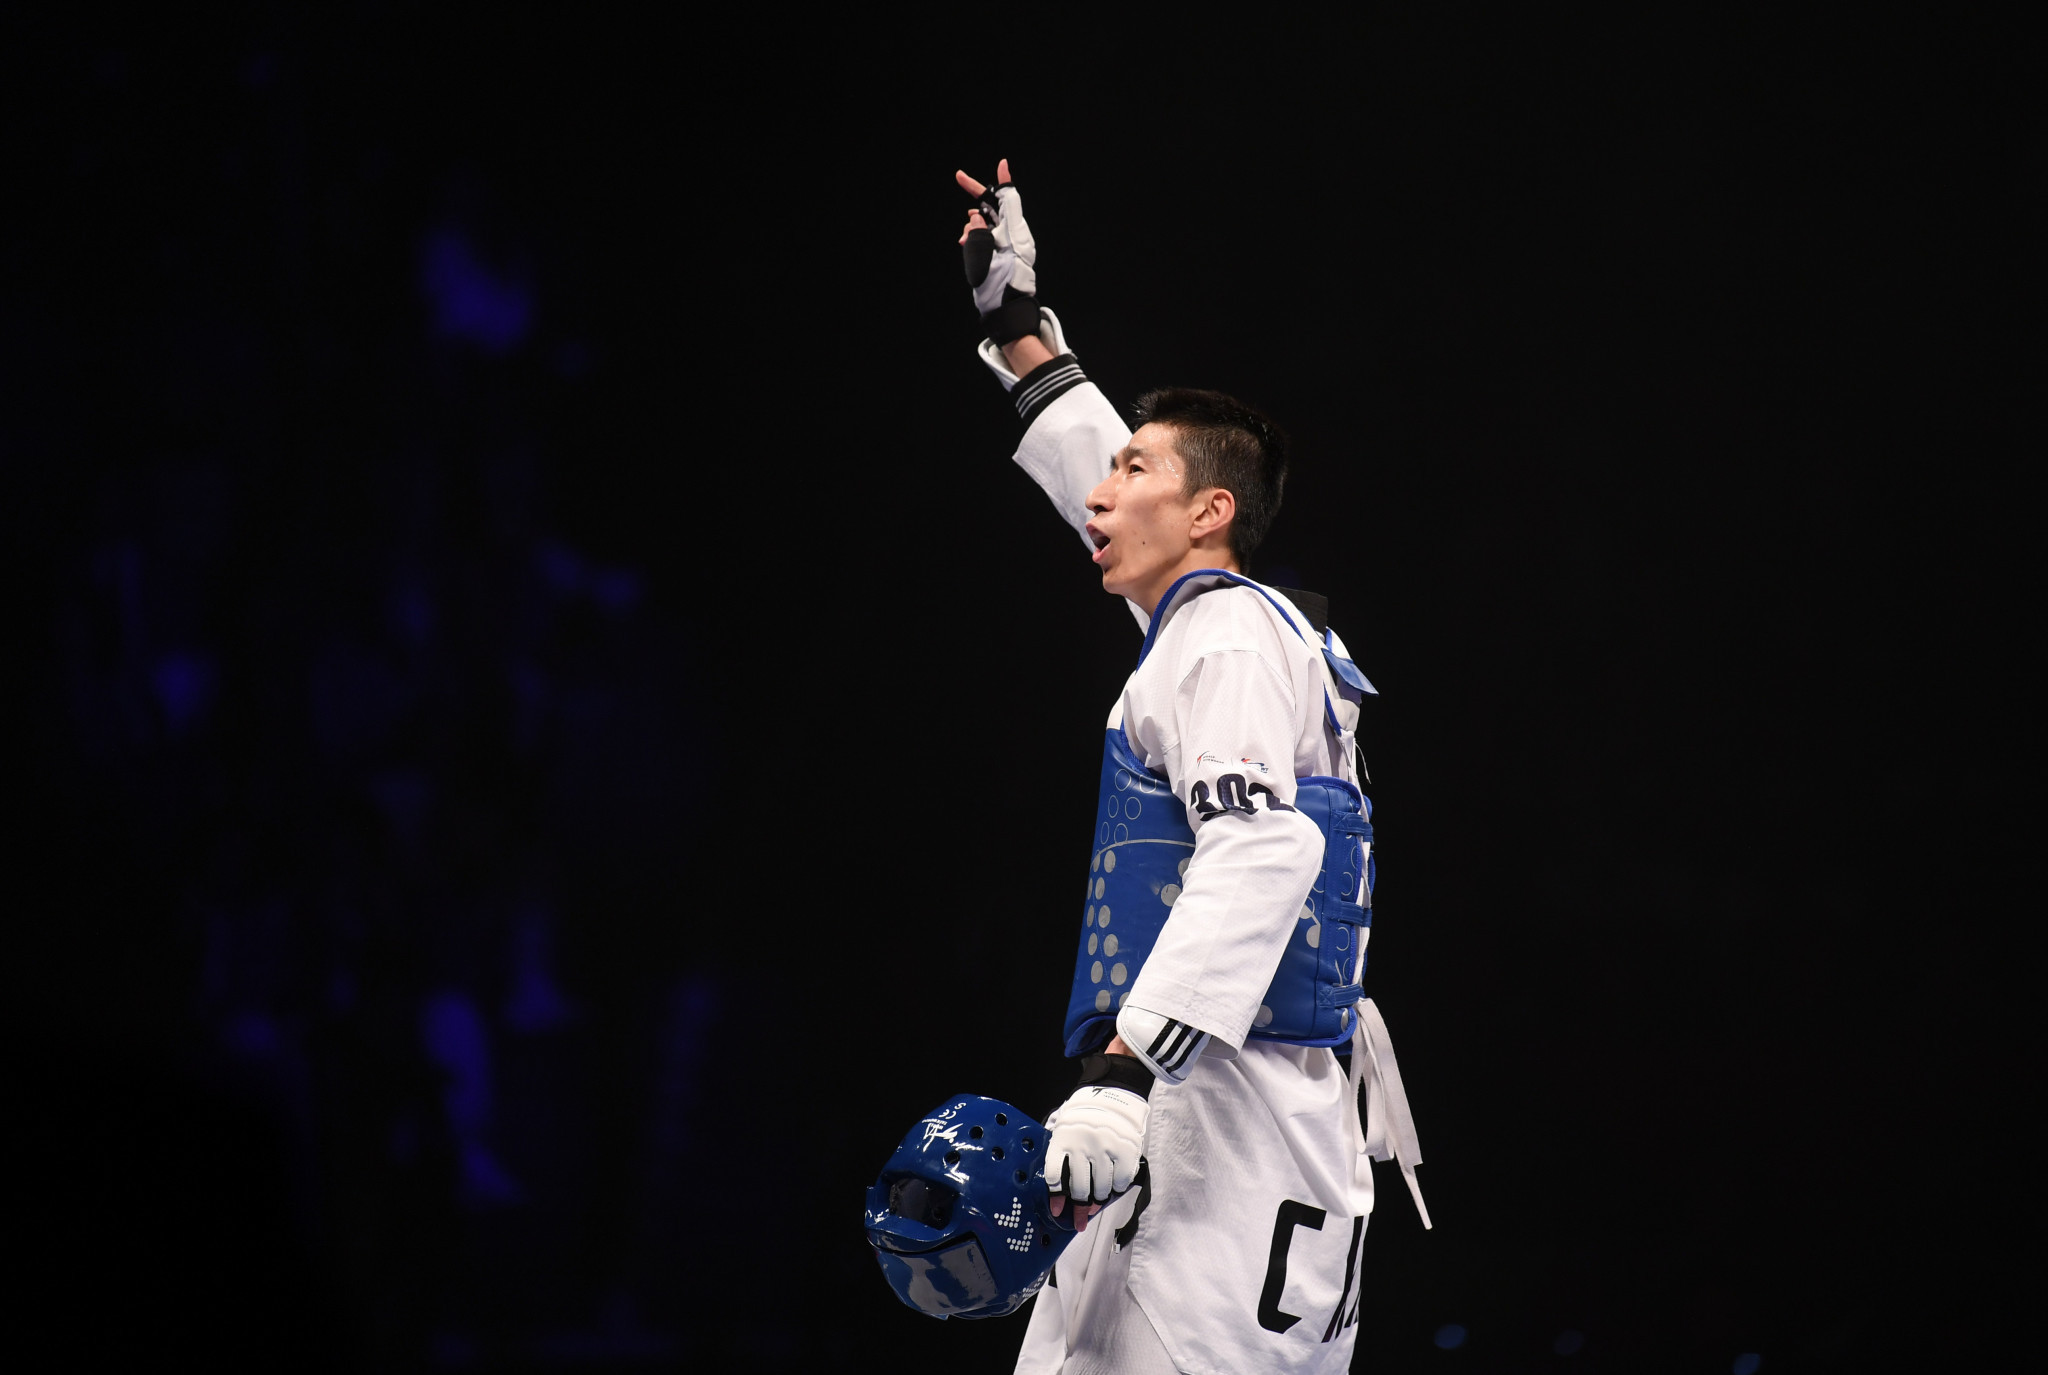 Taekwondo Olympic champion Zhao Shuai has been named as China's male flagbearer ©Getty Images